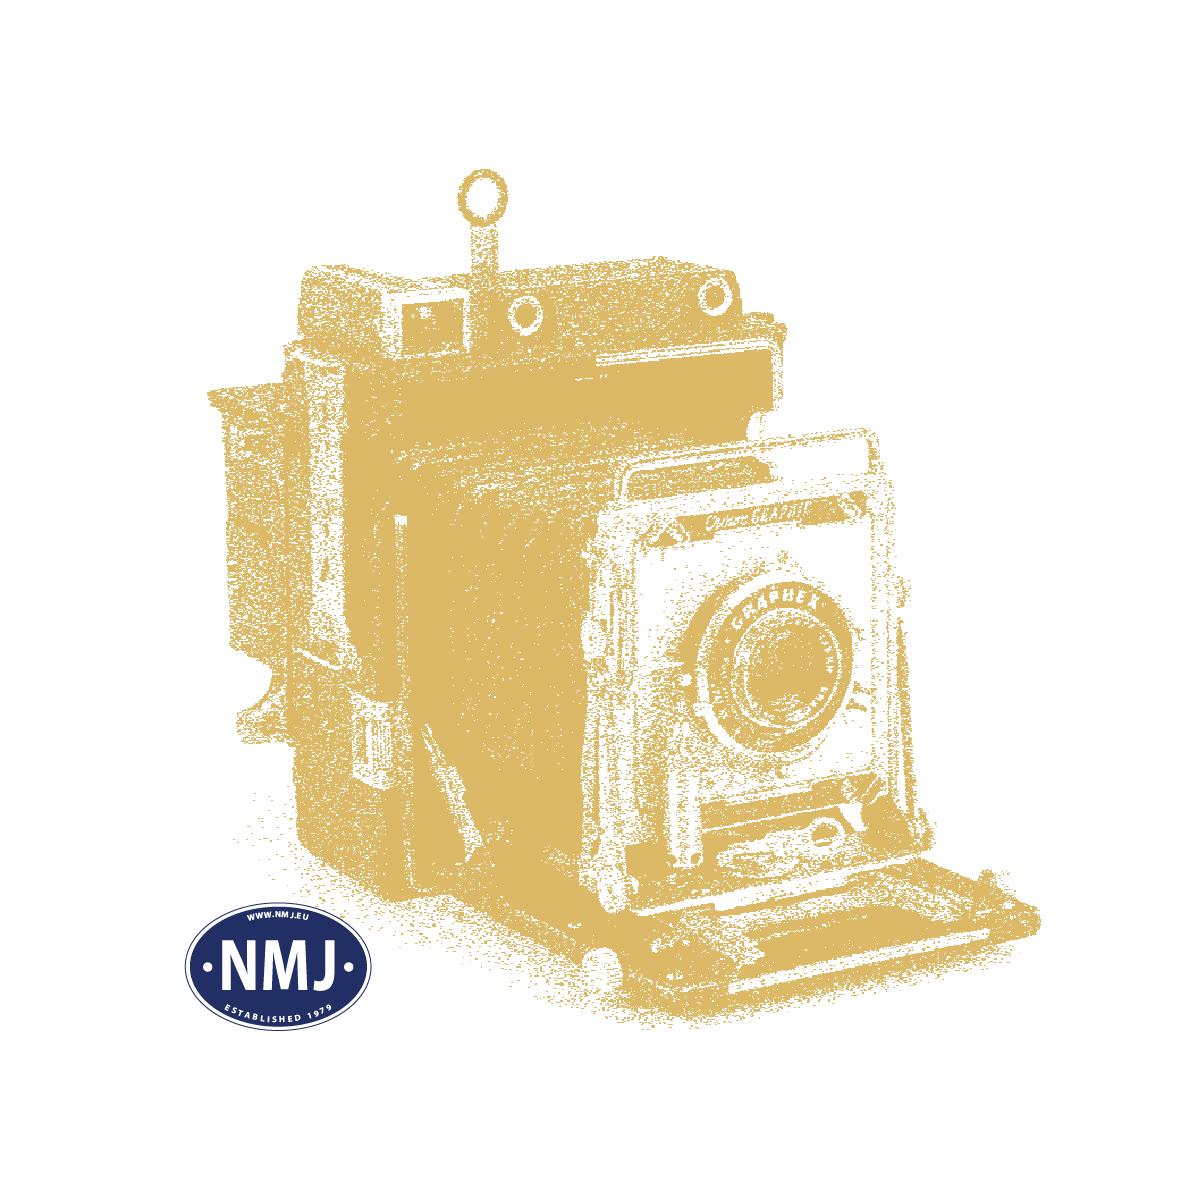 NMJT122.303 - NMJ Topline NSB B7-4 27013